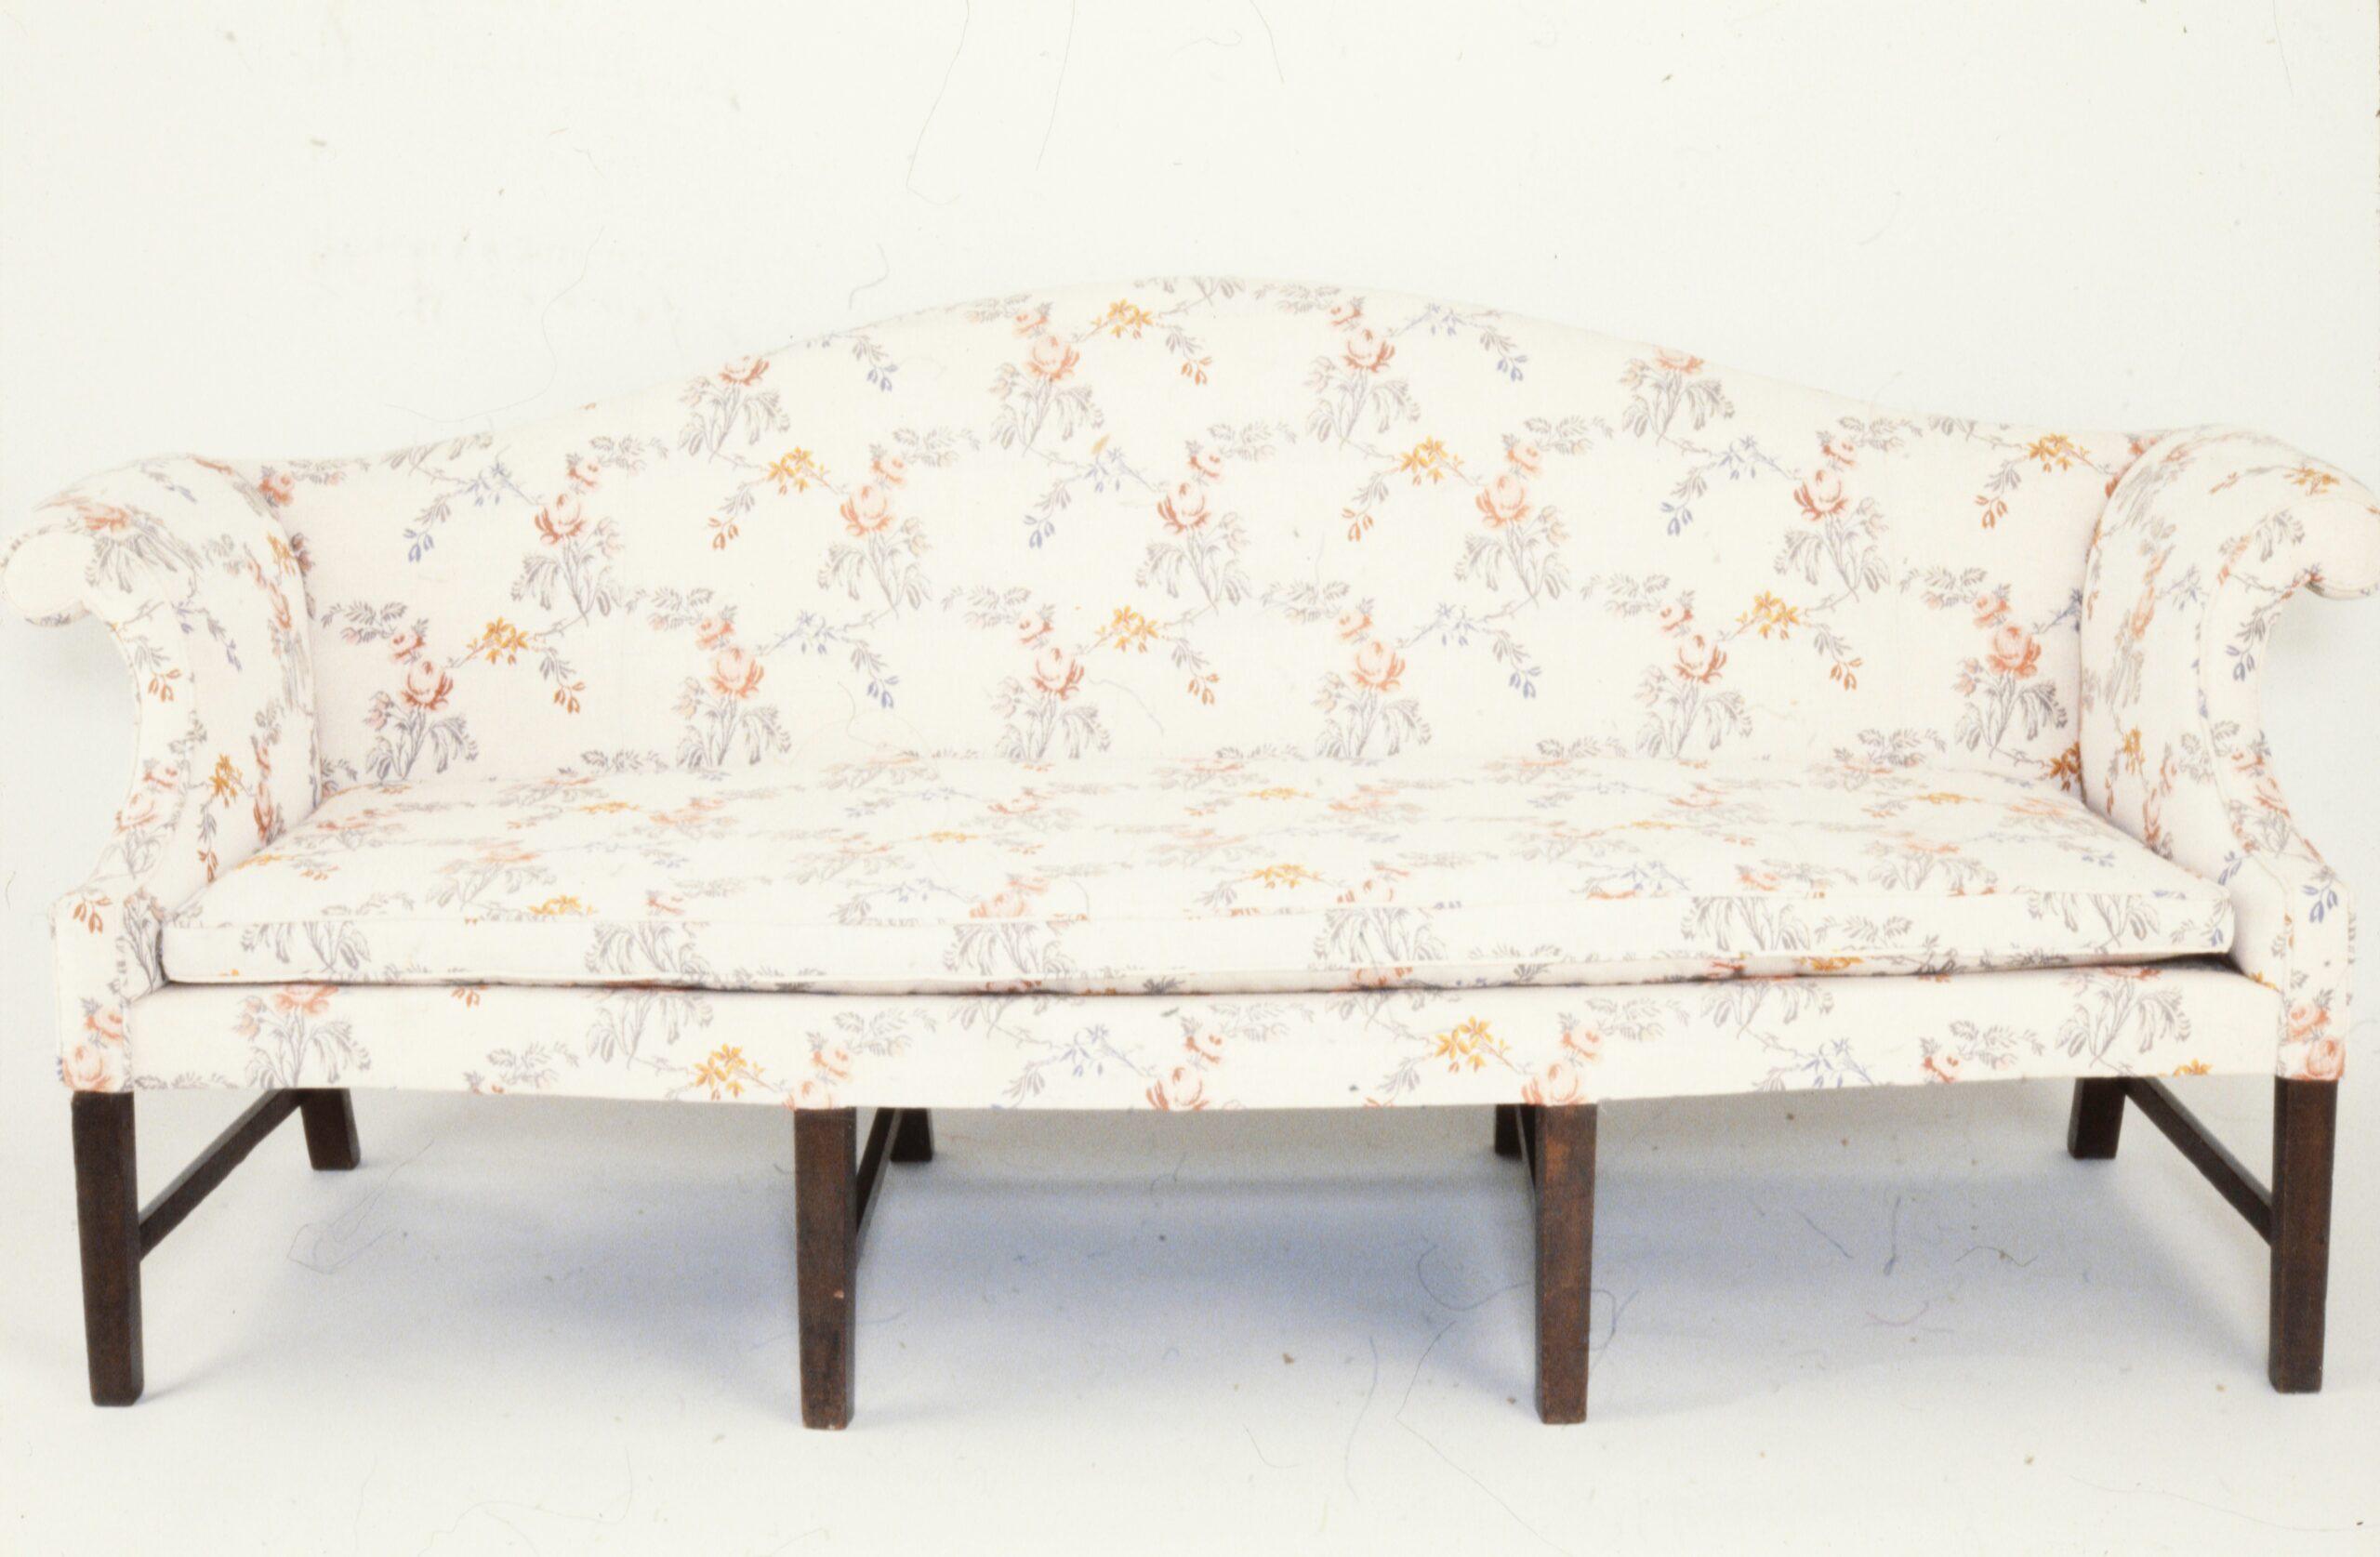 Full Size of Lane Chippendale Sofa Table Furniture For Sale Style Cover History Wk Chesterfield Leder Rattan Kissen Garnitur Kleines Blaues Hussen L Form Günstig Kaufen Sofa Chippendale Sofa